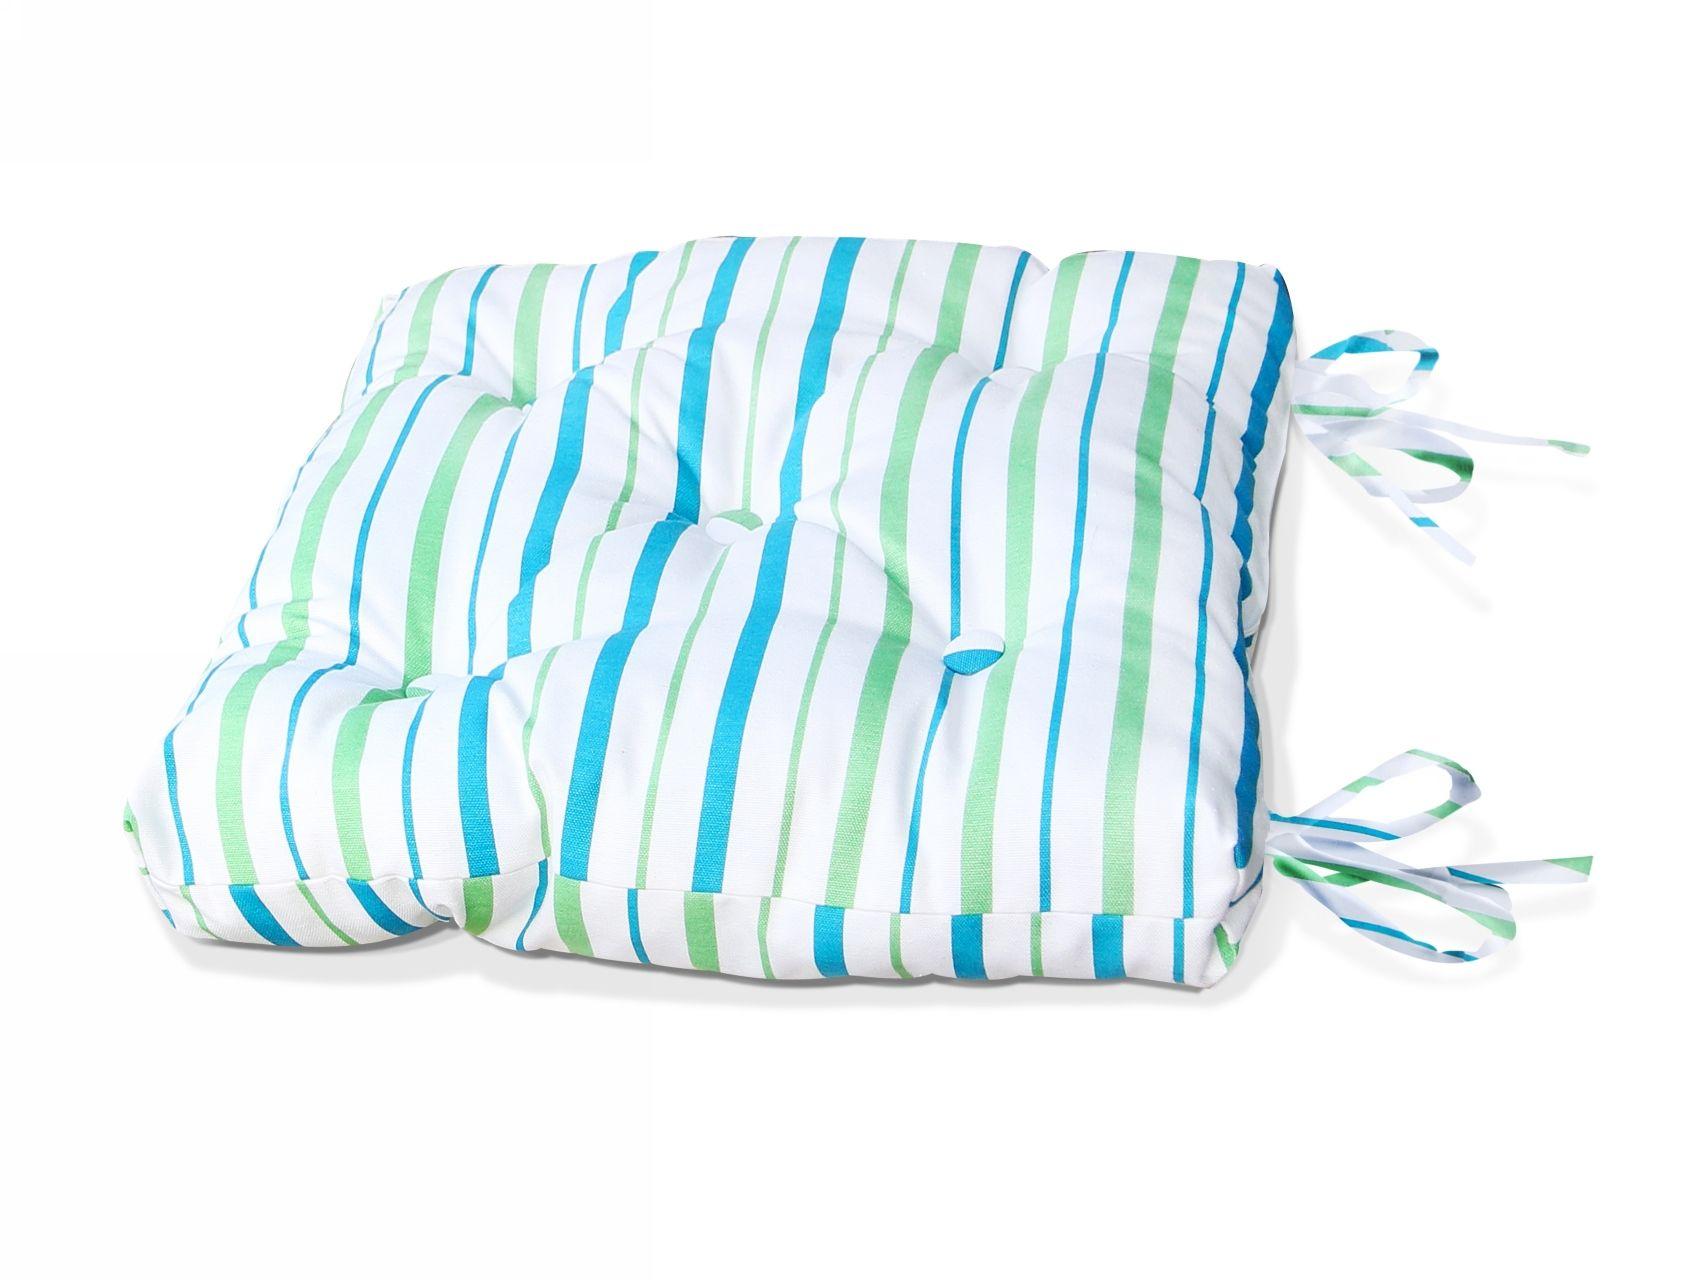 Подушки на стул Kauffort Подушка на стул Rain Цвет: Небесно-Голубой (40х40) подушка на стул адмирал цвет голубой синий 40 х 40 см